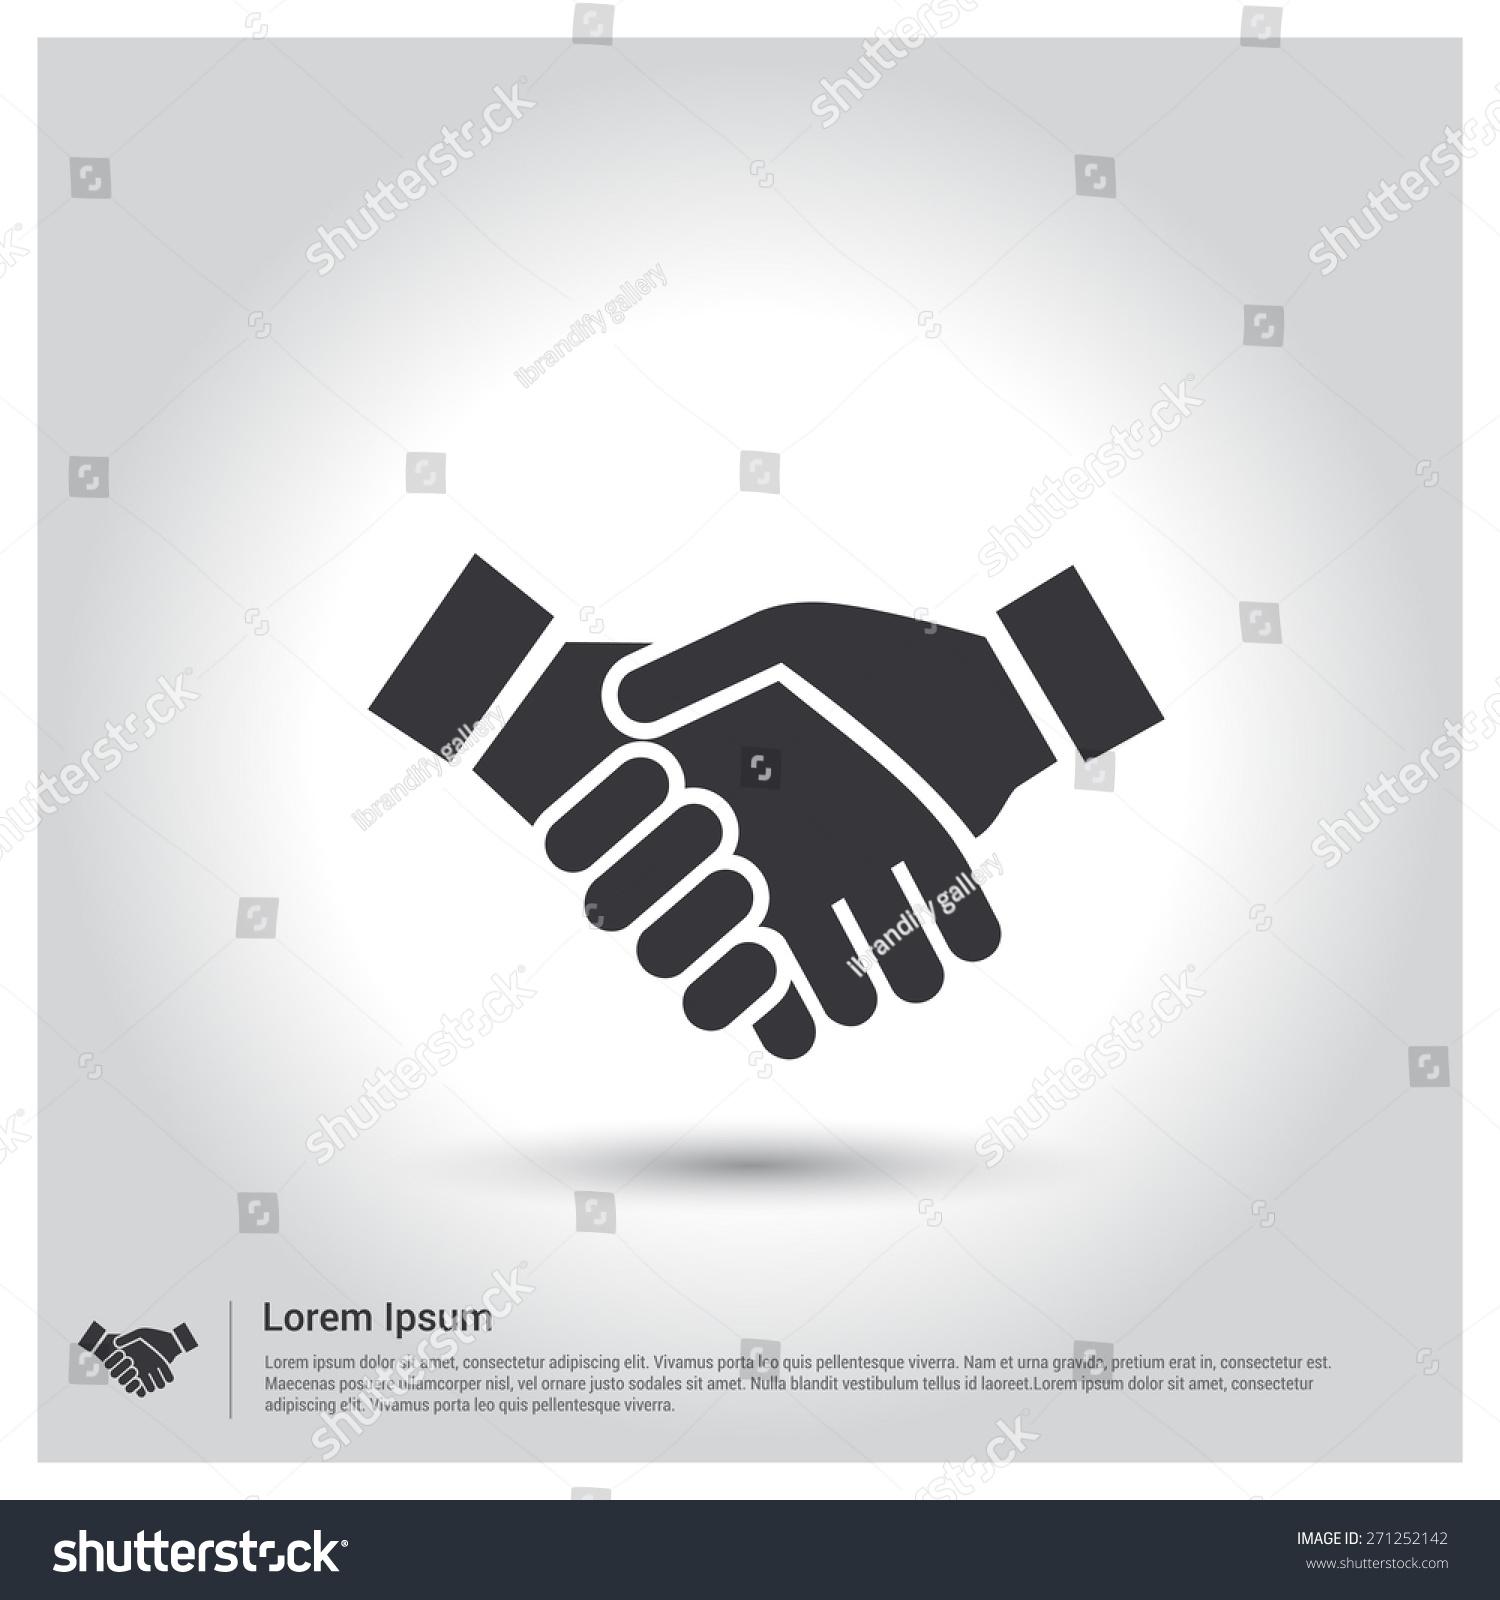 Handshake icon business agreement icon pictogram icon on gray voltagebd Choice Image